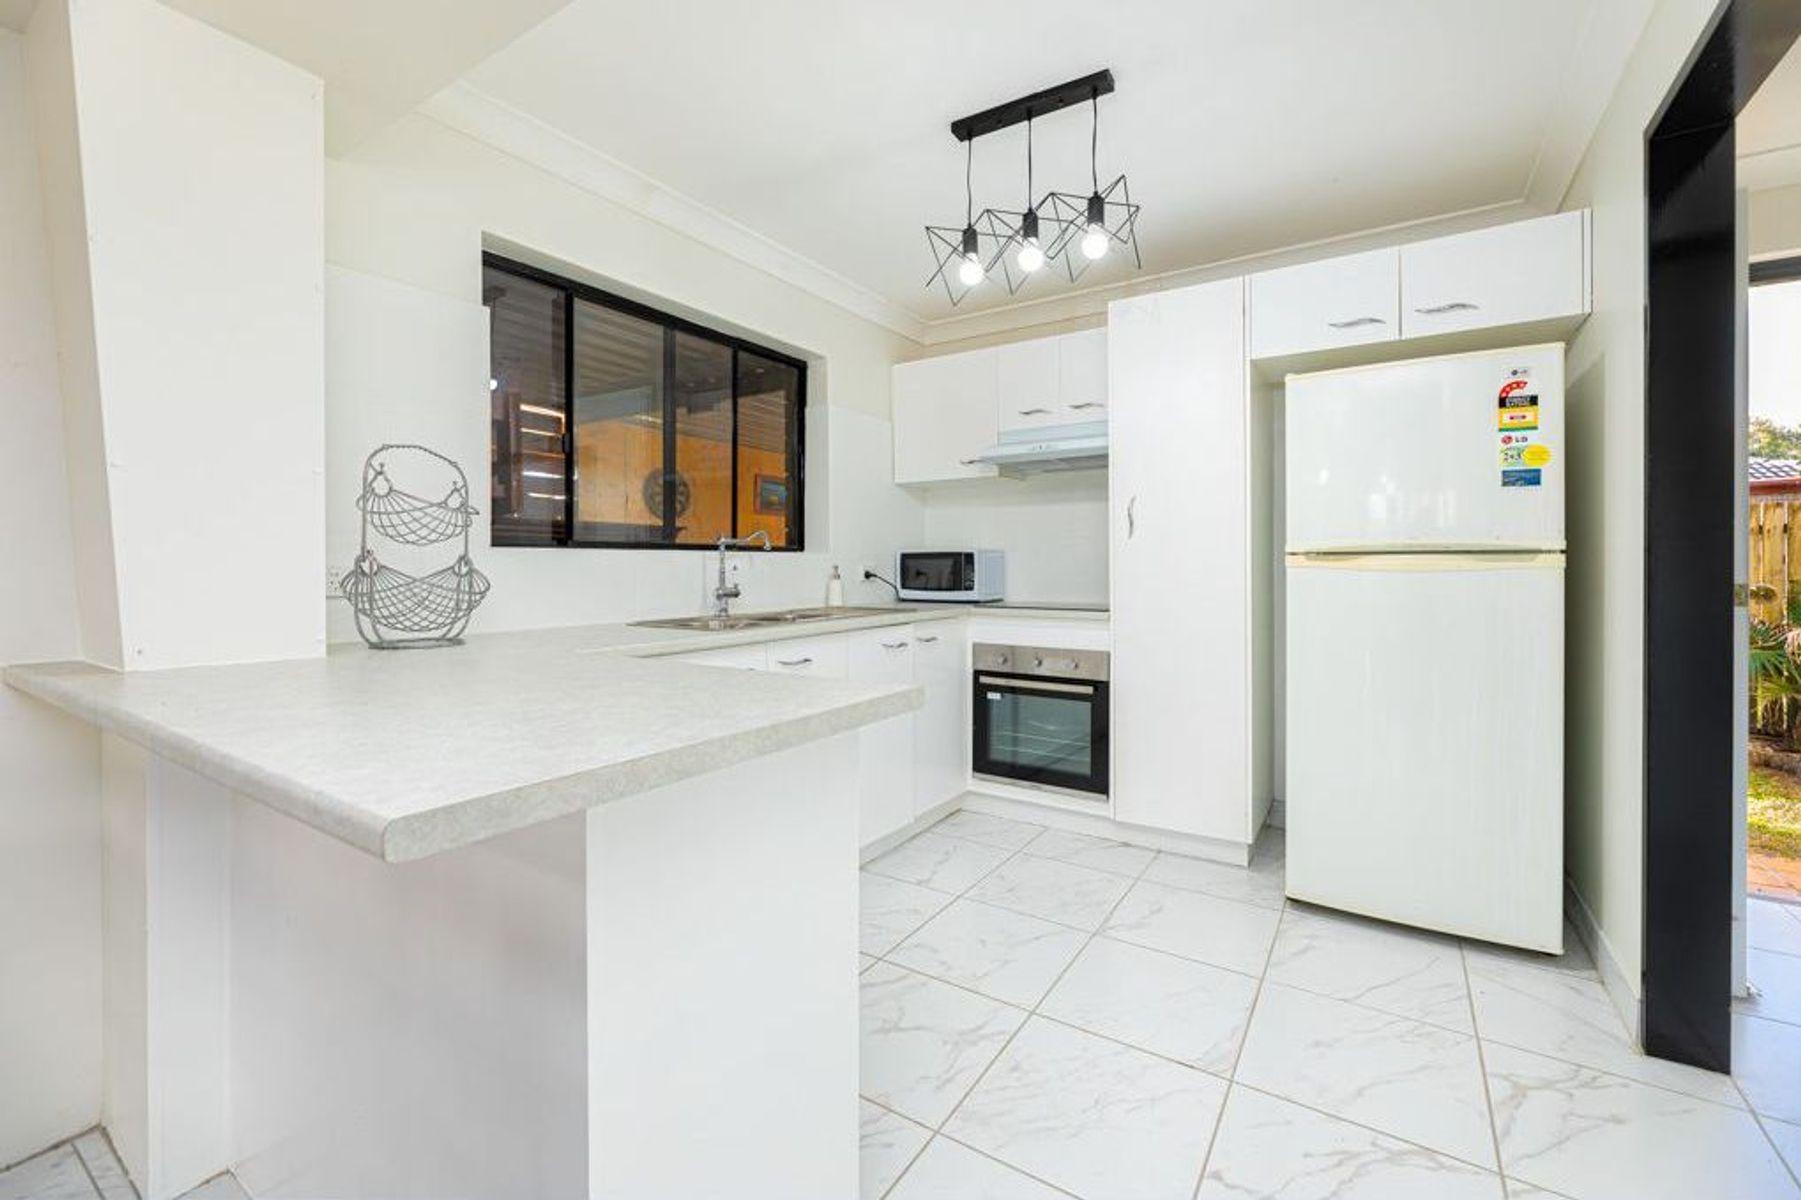 9/13 Burrawong Avenue, Bongaree, QLD 4507